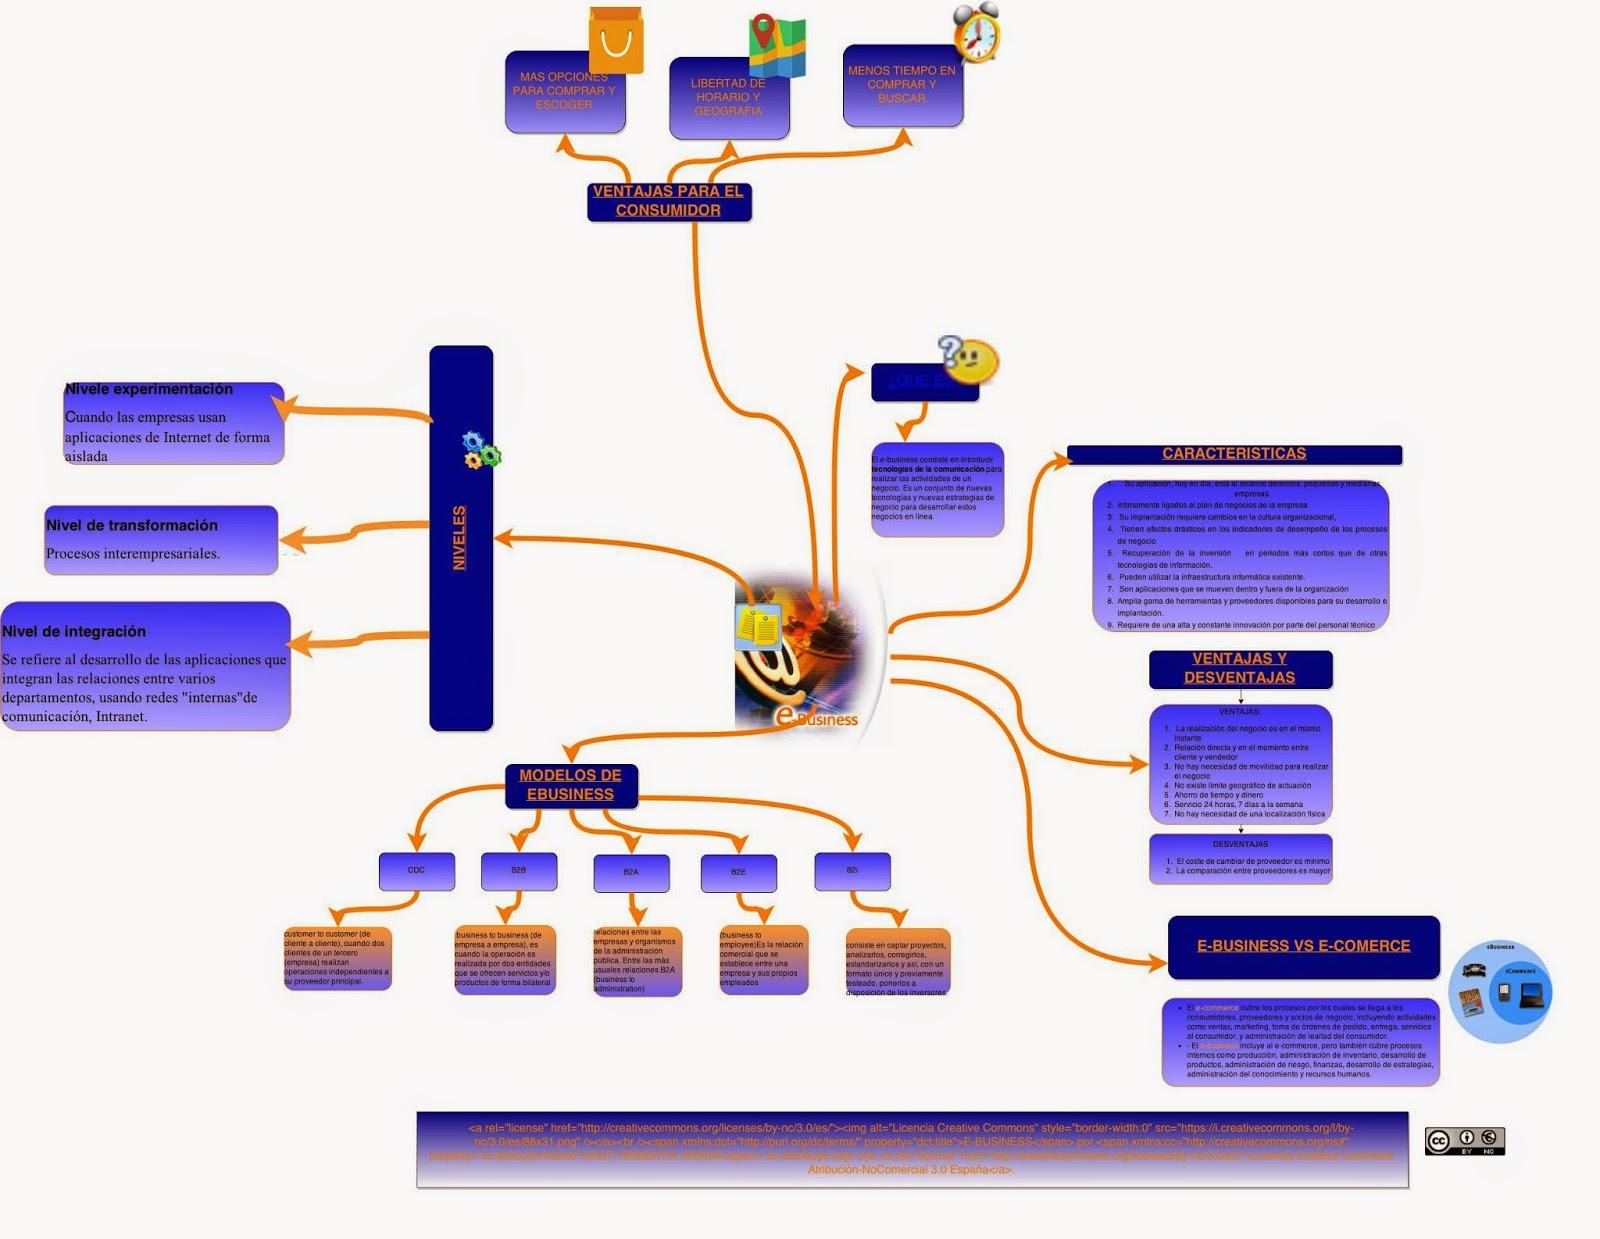 Sistemas de informacion empresariales: MAPA MENTAL E-BUSINESS